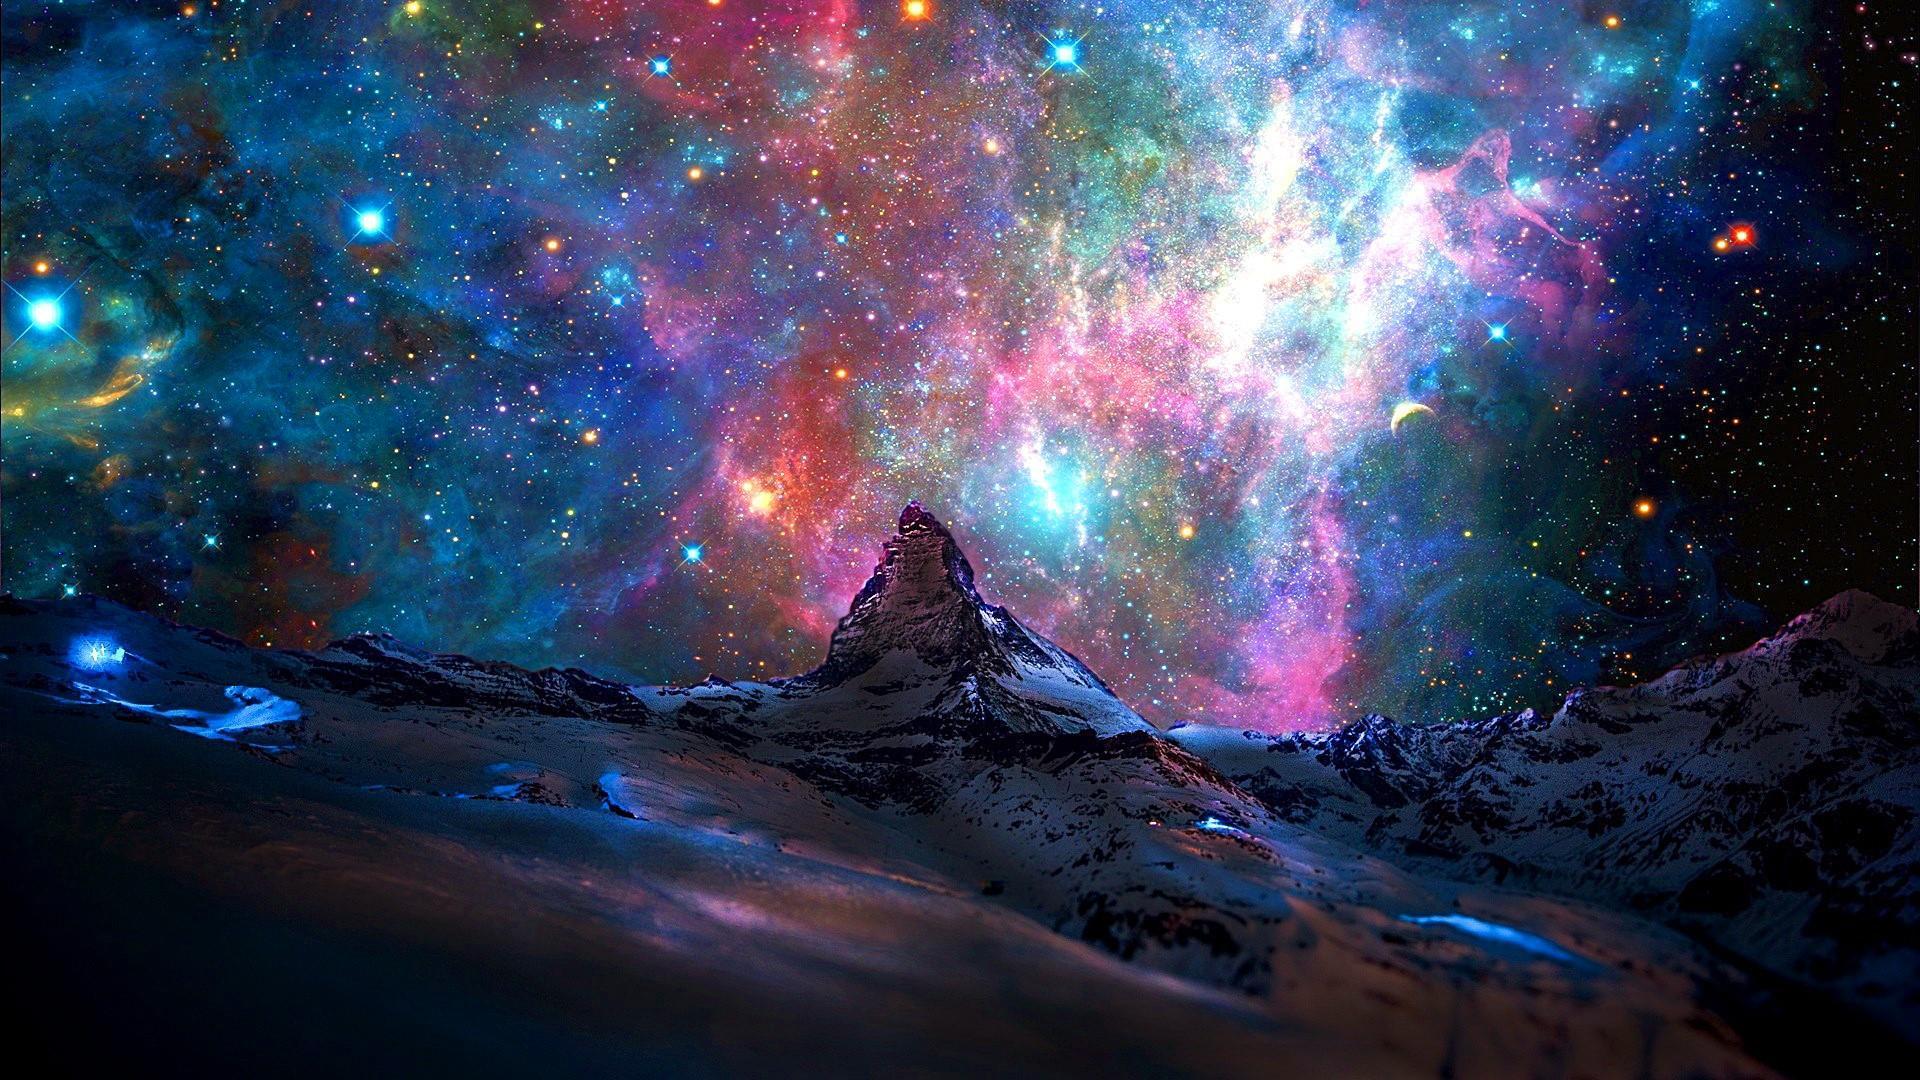 Art Galaxy Wallpapers Top Free Art Galaxy Backgrounds Wallpaperaccess